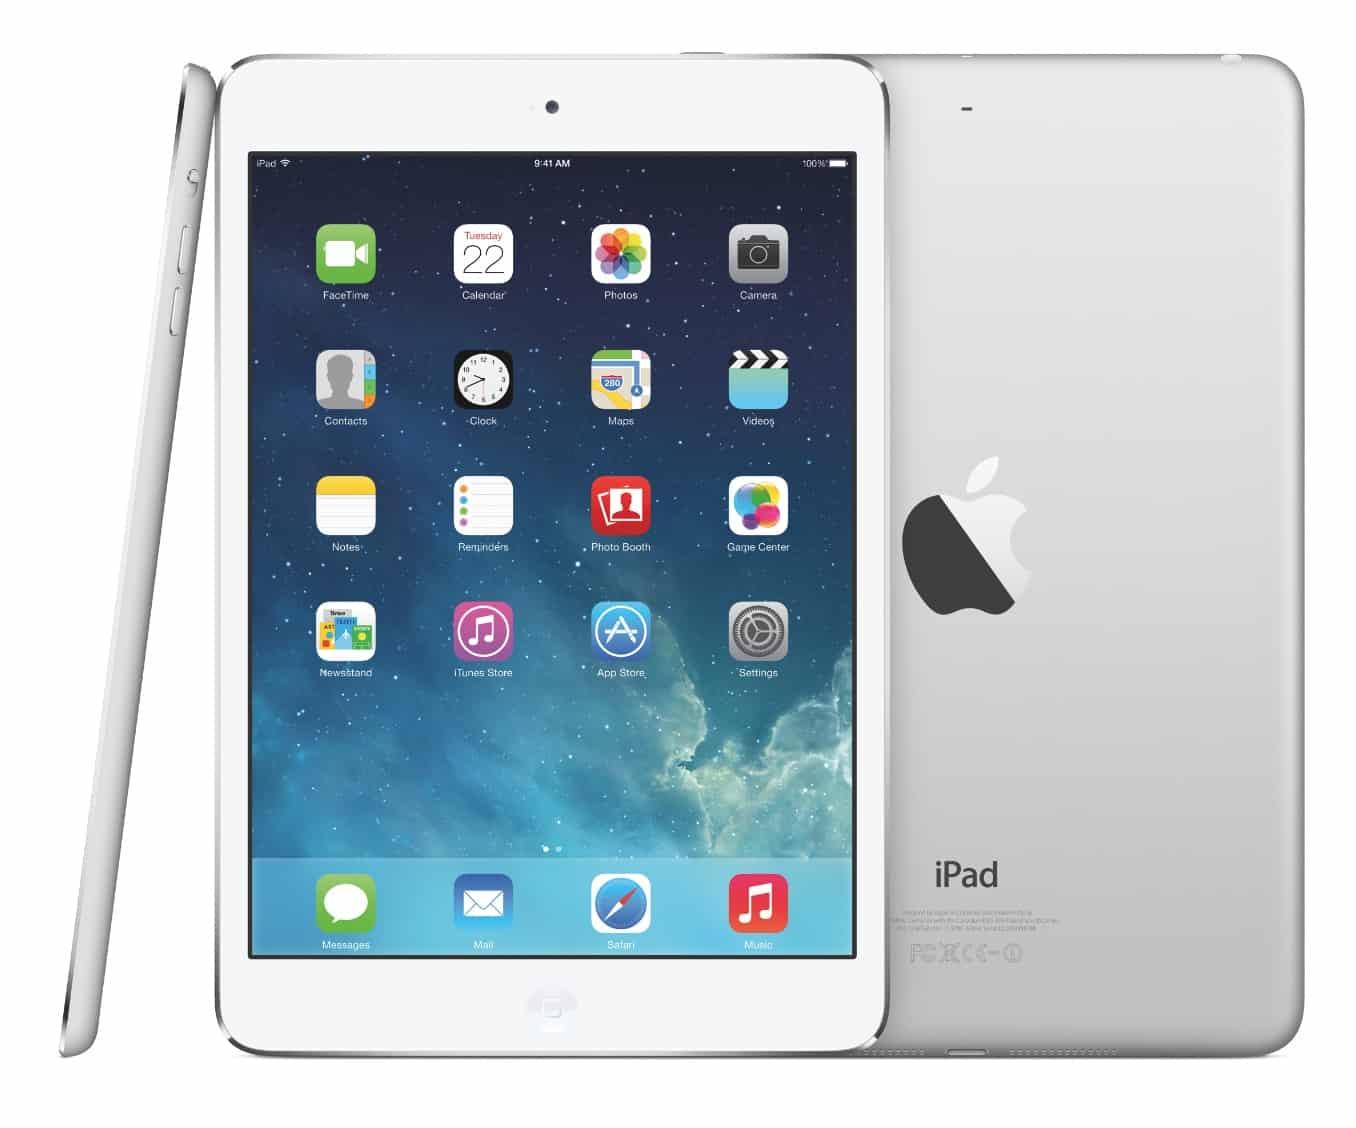 Boatos indicam que novo iPad Air 2 terá 2 Gb de Ram